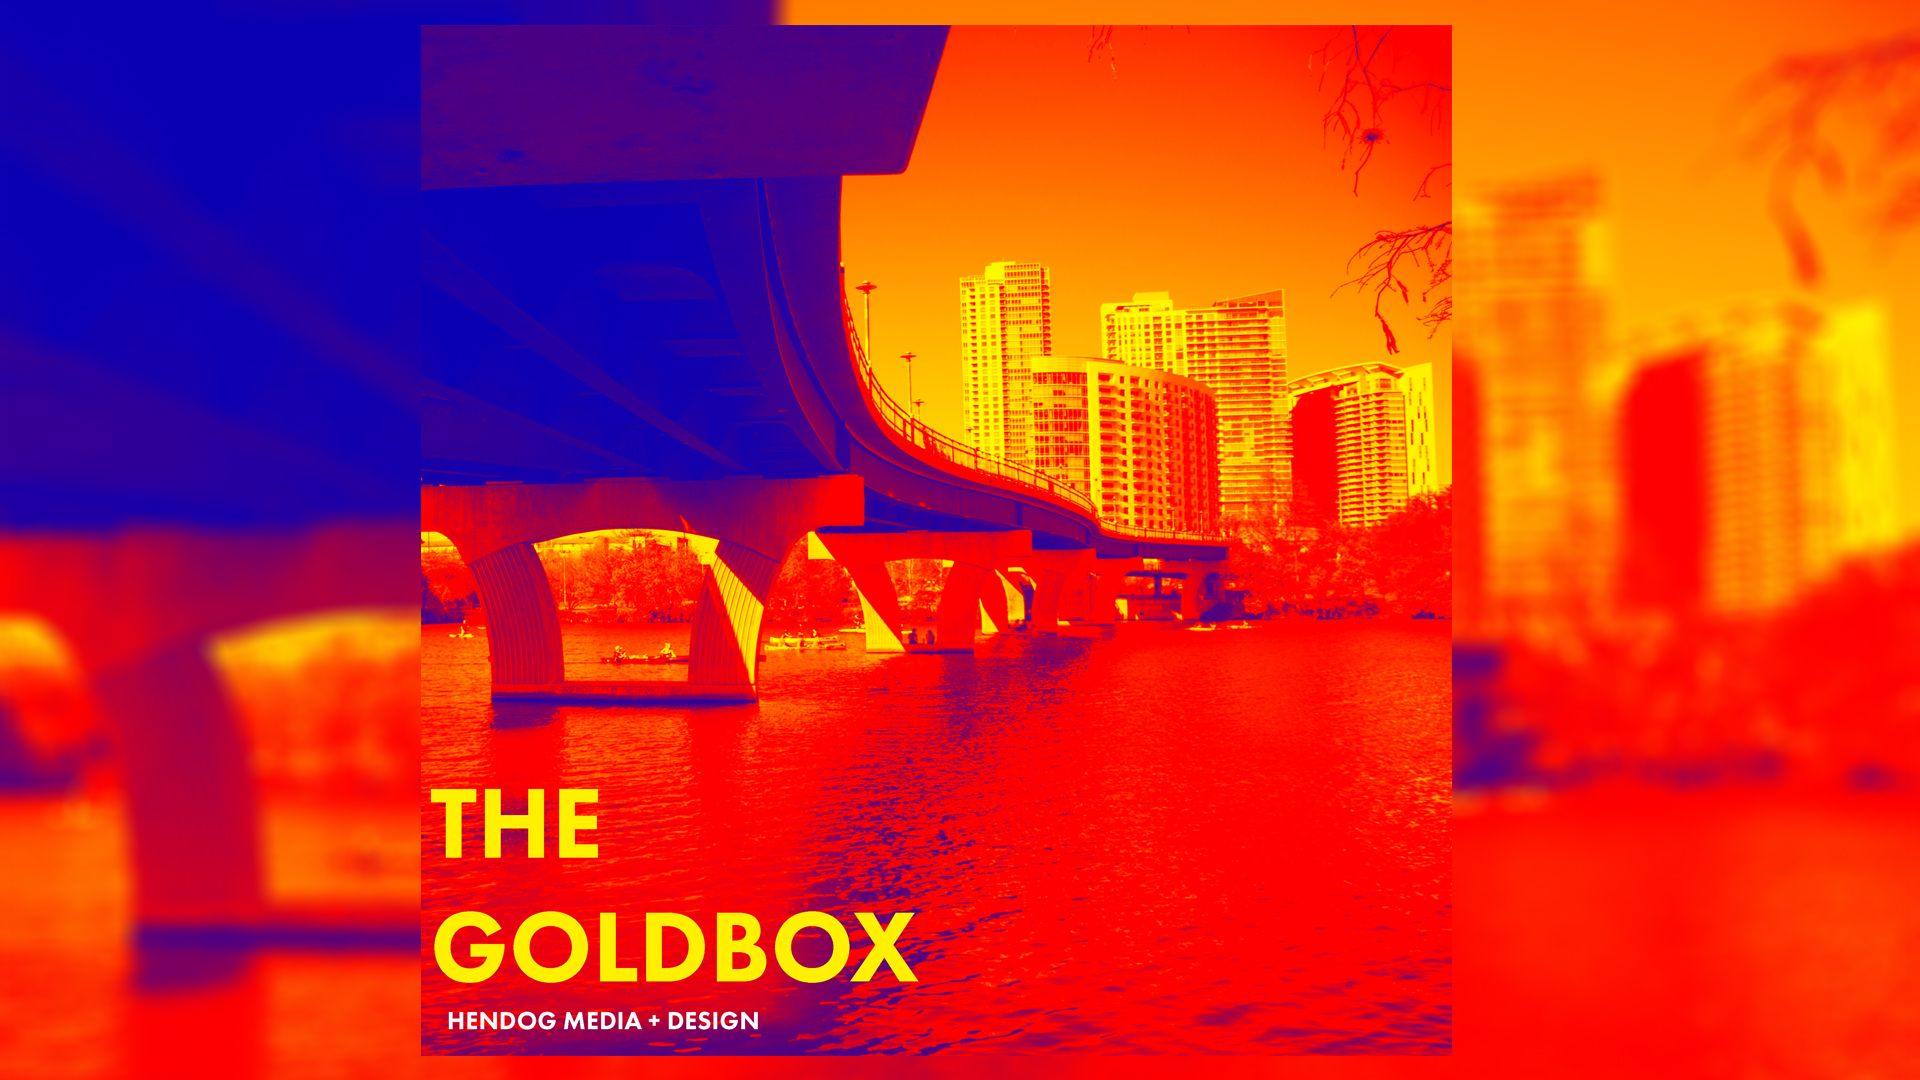 HDMD THE GOLDBOX Podcast Bump v 1.0.jpg